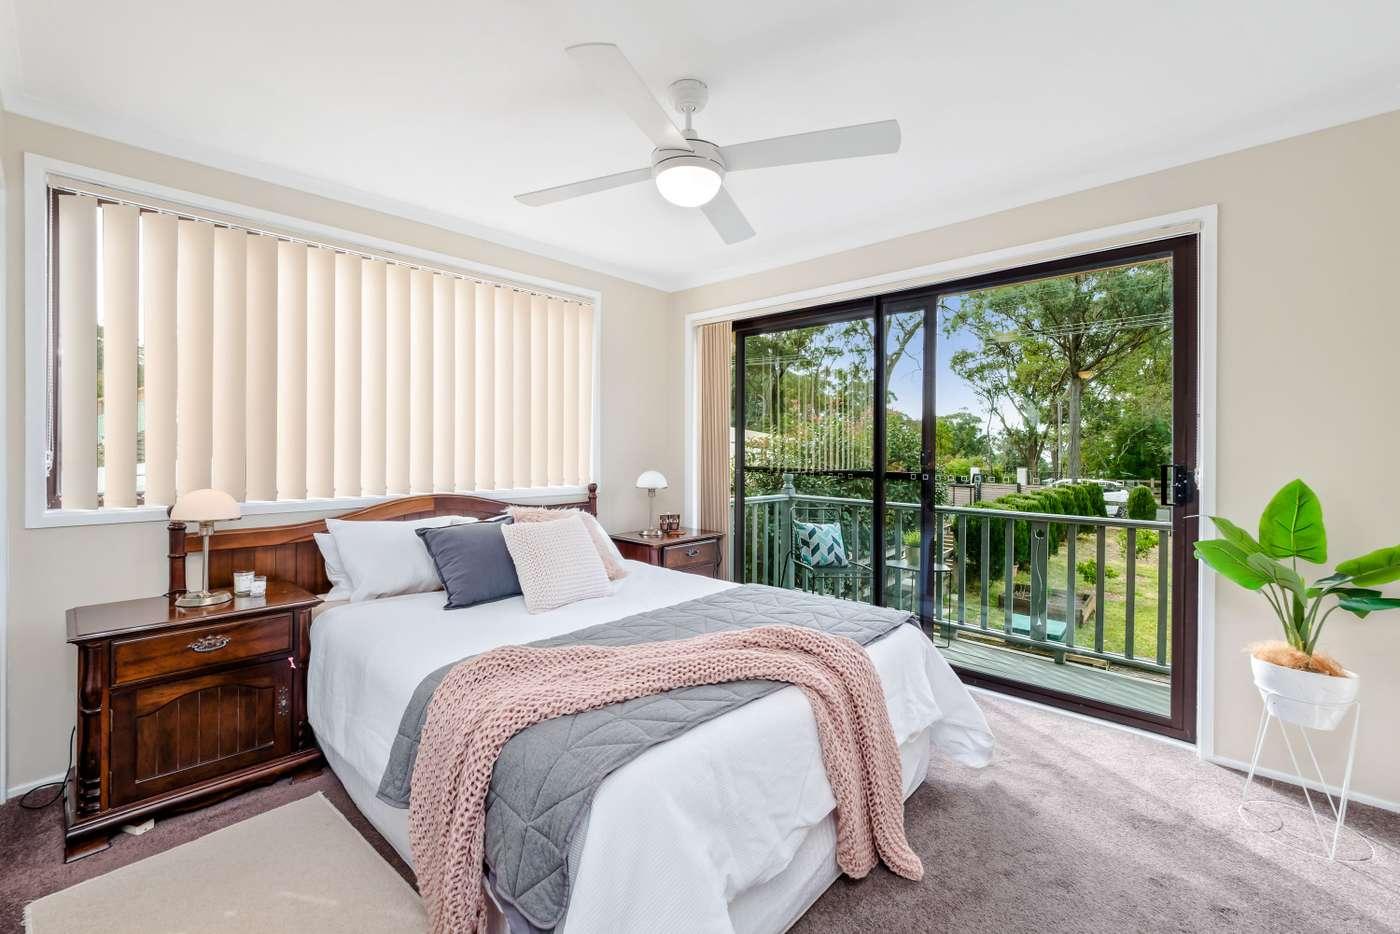 Seventh view of Homely house listing, 250 Lieutenant Bowen Drive, Bowen Mountain NSW 2753